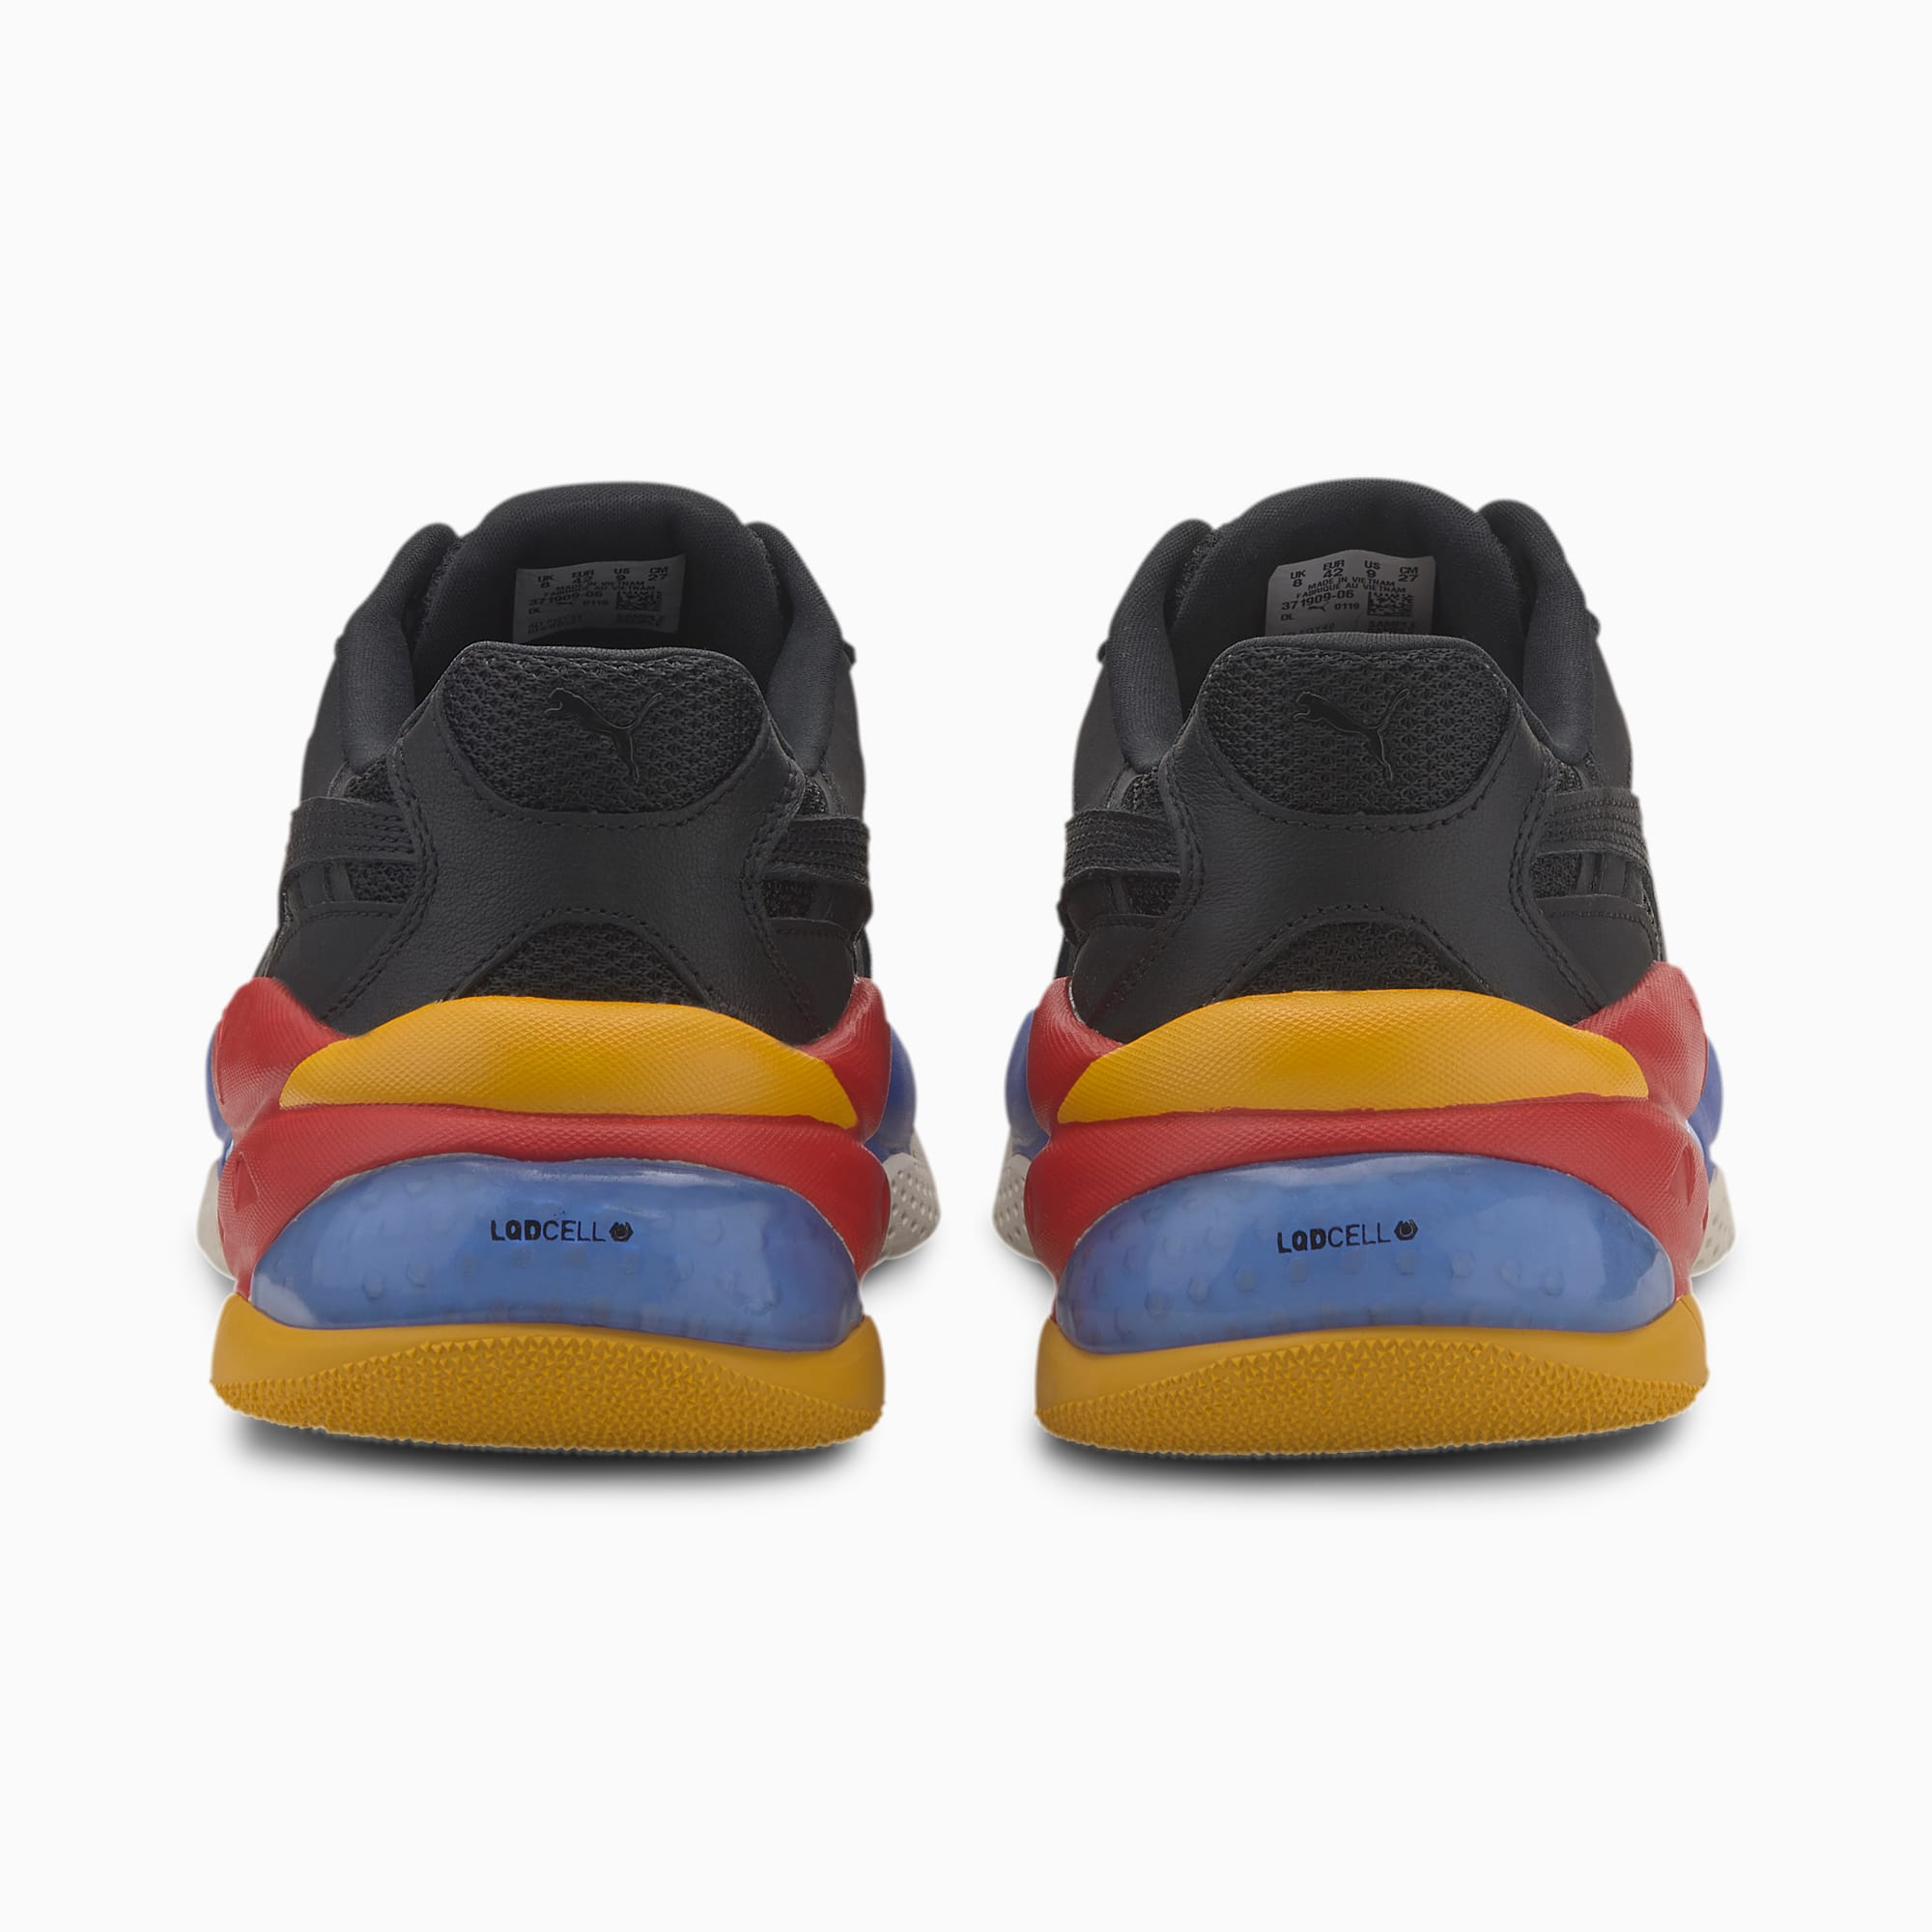 LQDCELL Epsilon sneakers